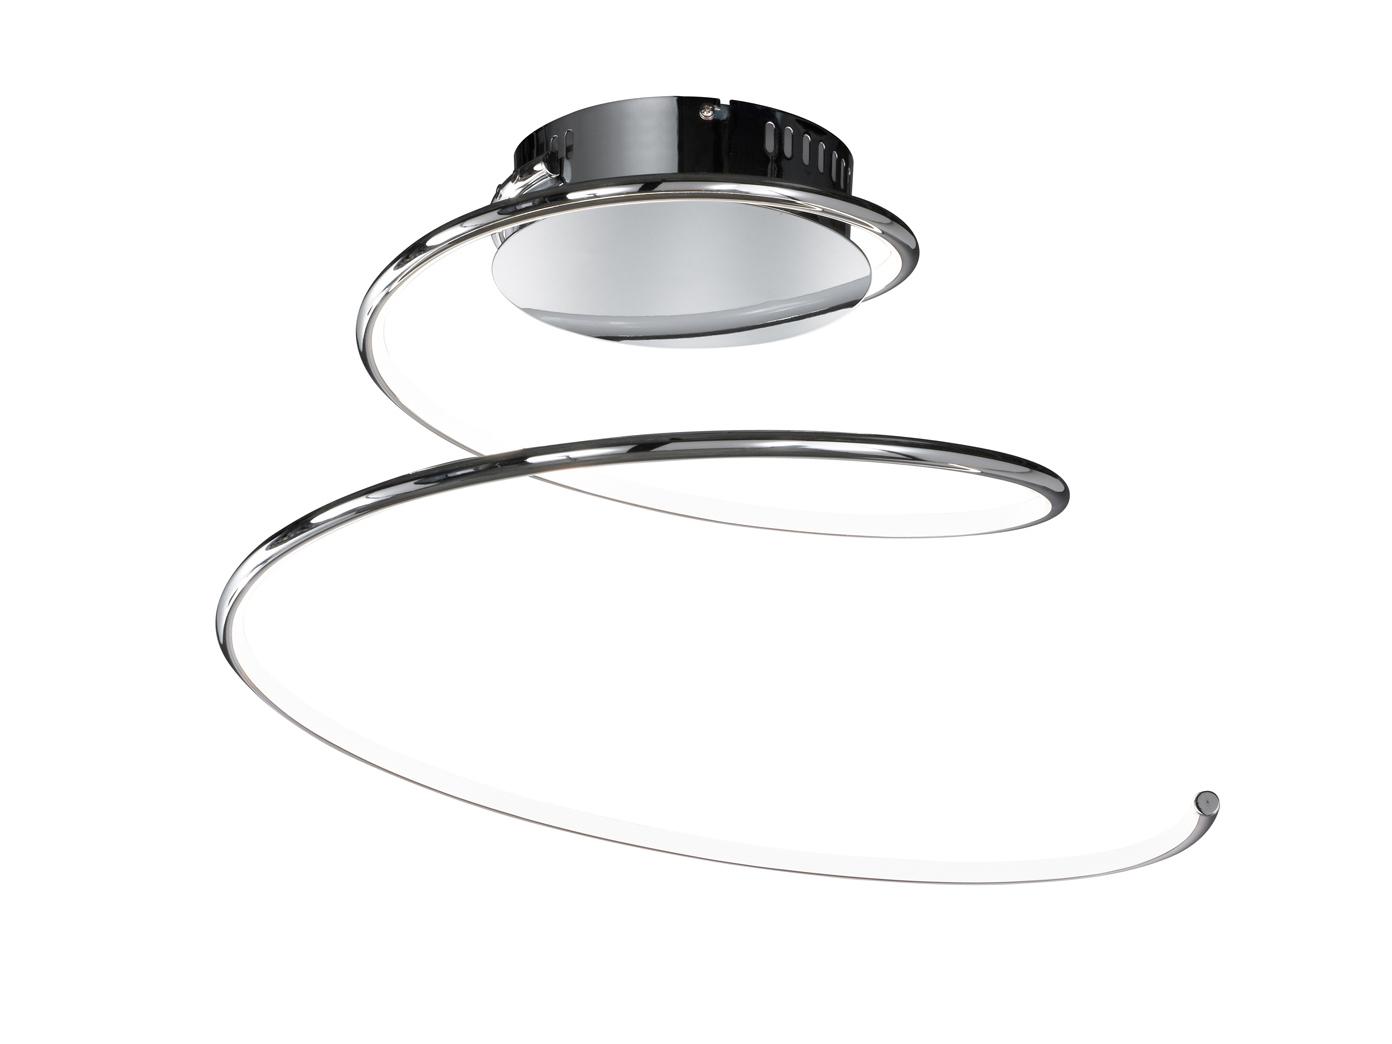 led deckenleuchte linee 48cm chrom deckenlampen. Black Bedroom Furniture Sets. Home Design Ideas